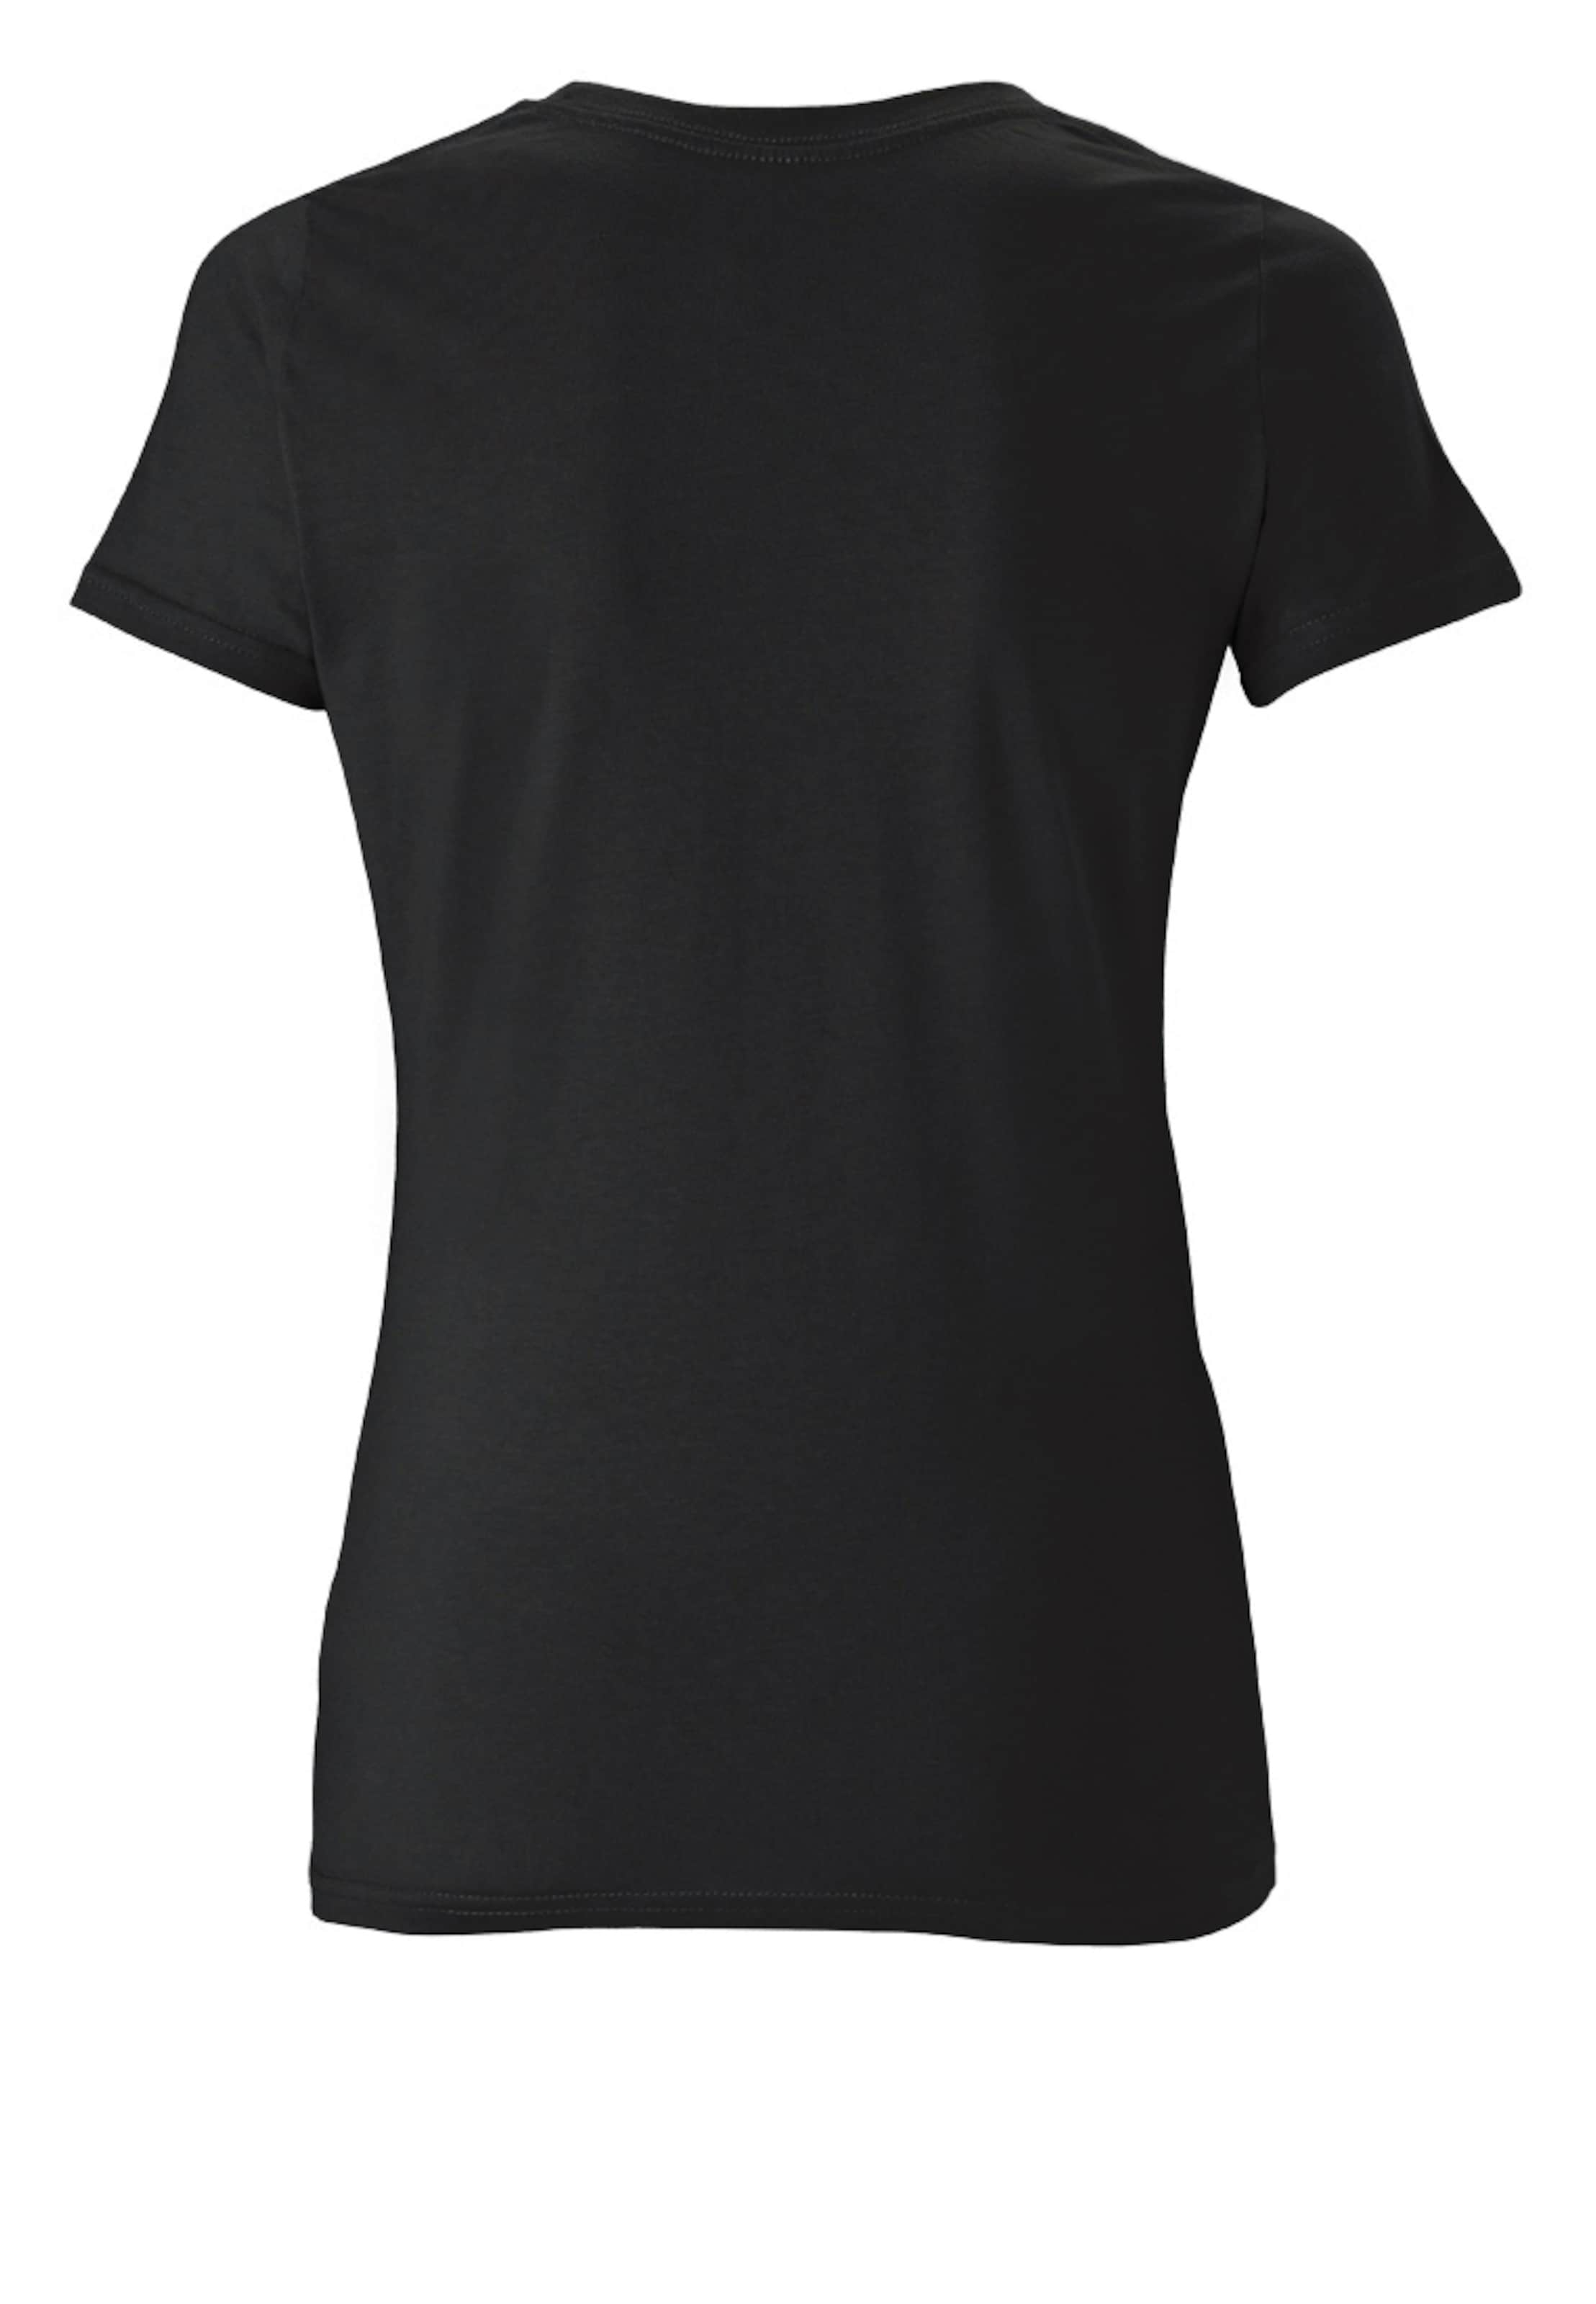 Logoshirt Steel' In Schwarz Of 'supermanMan T shirt WdCBoerx